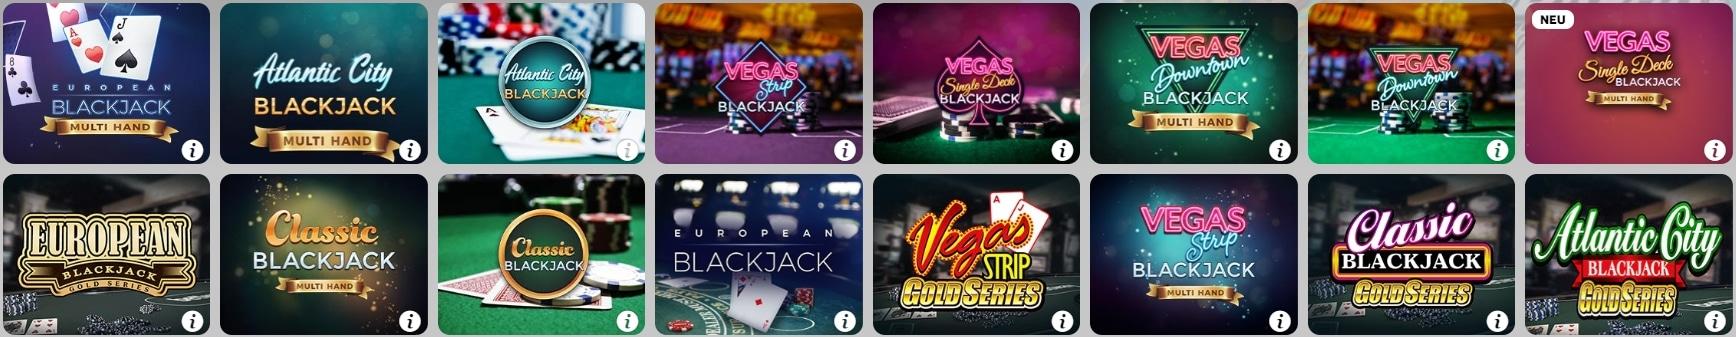 Betway Casino Spielen Blackjack